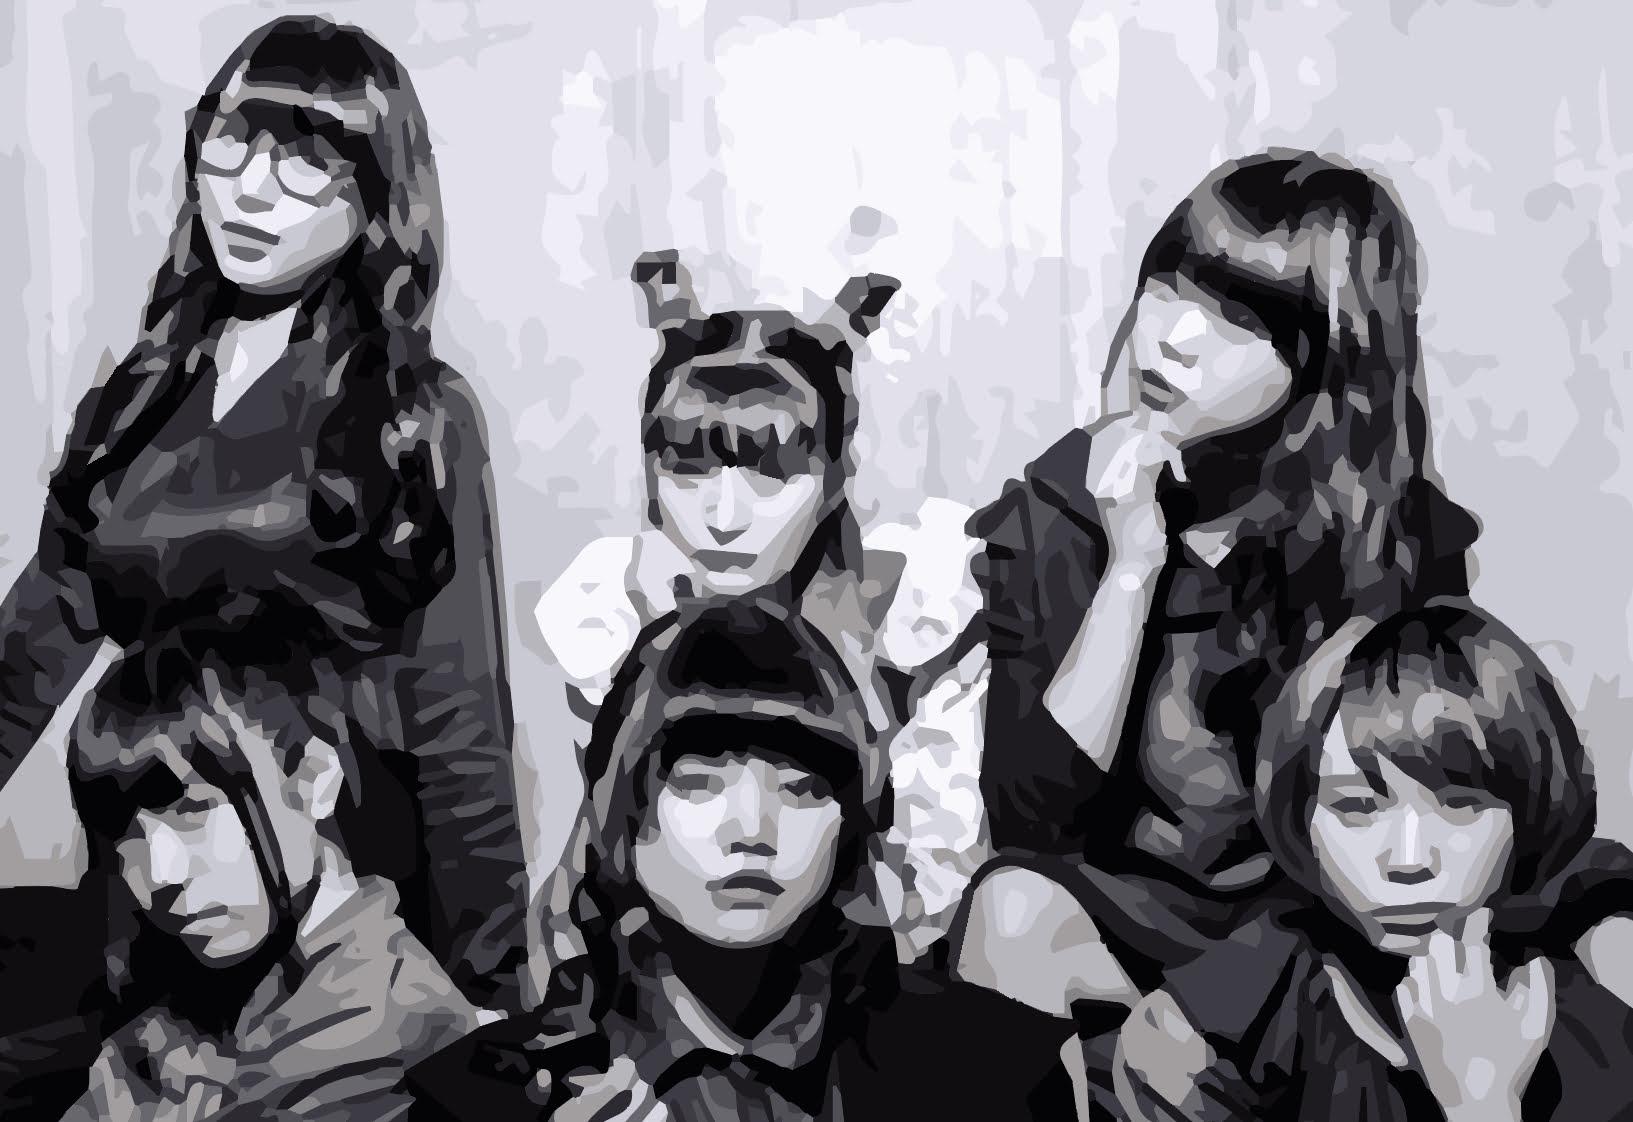 BiSHメンバーの黒い衣装の画像